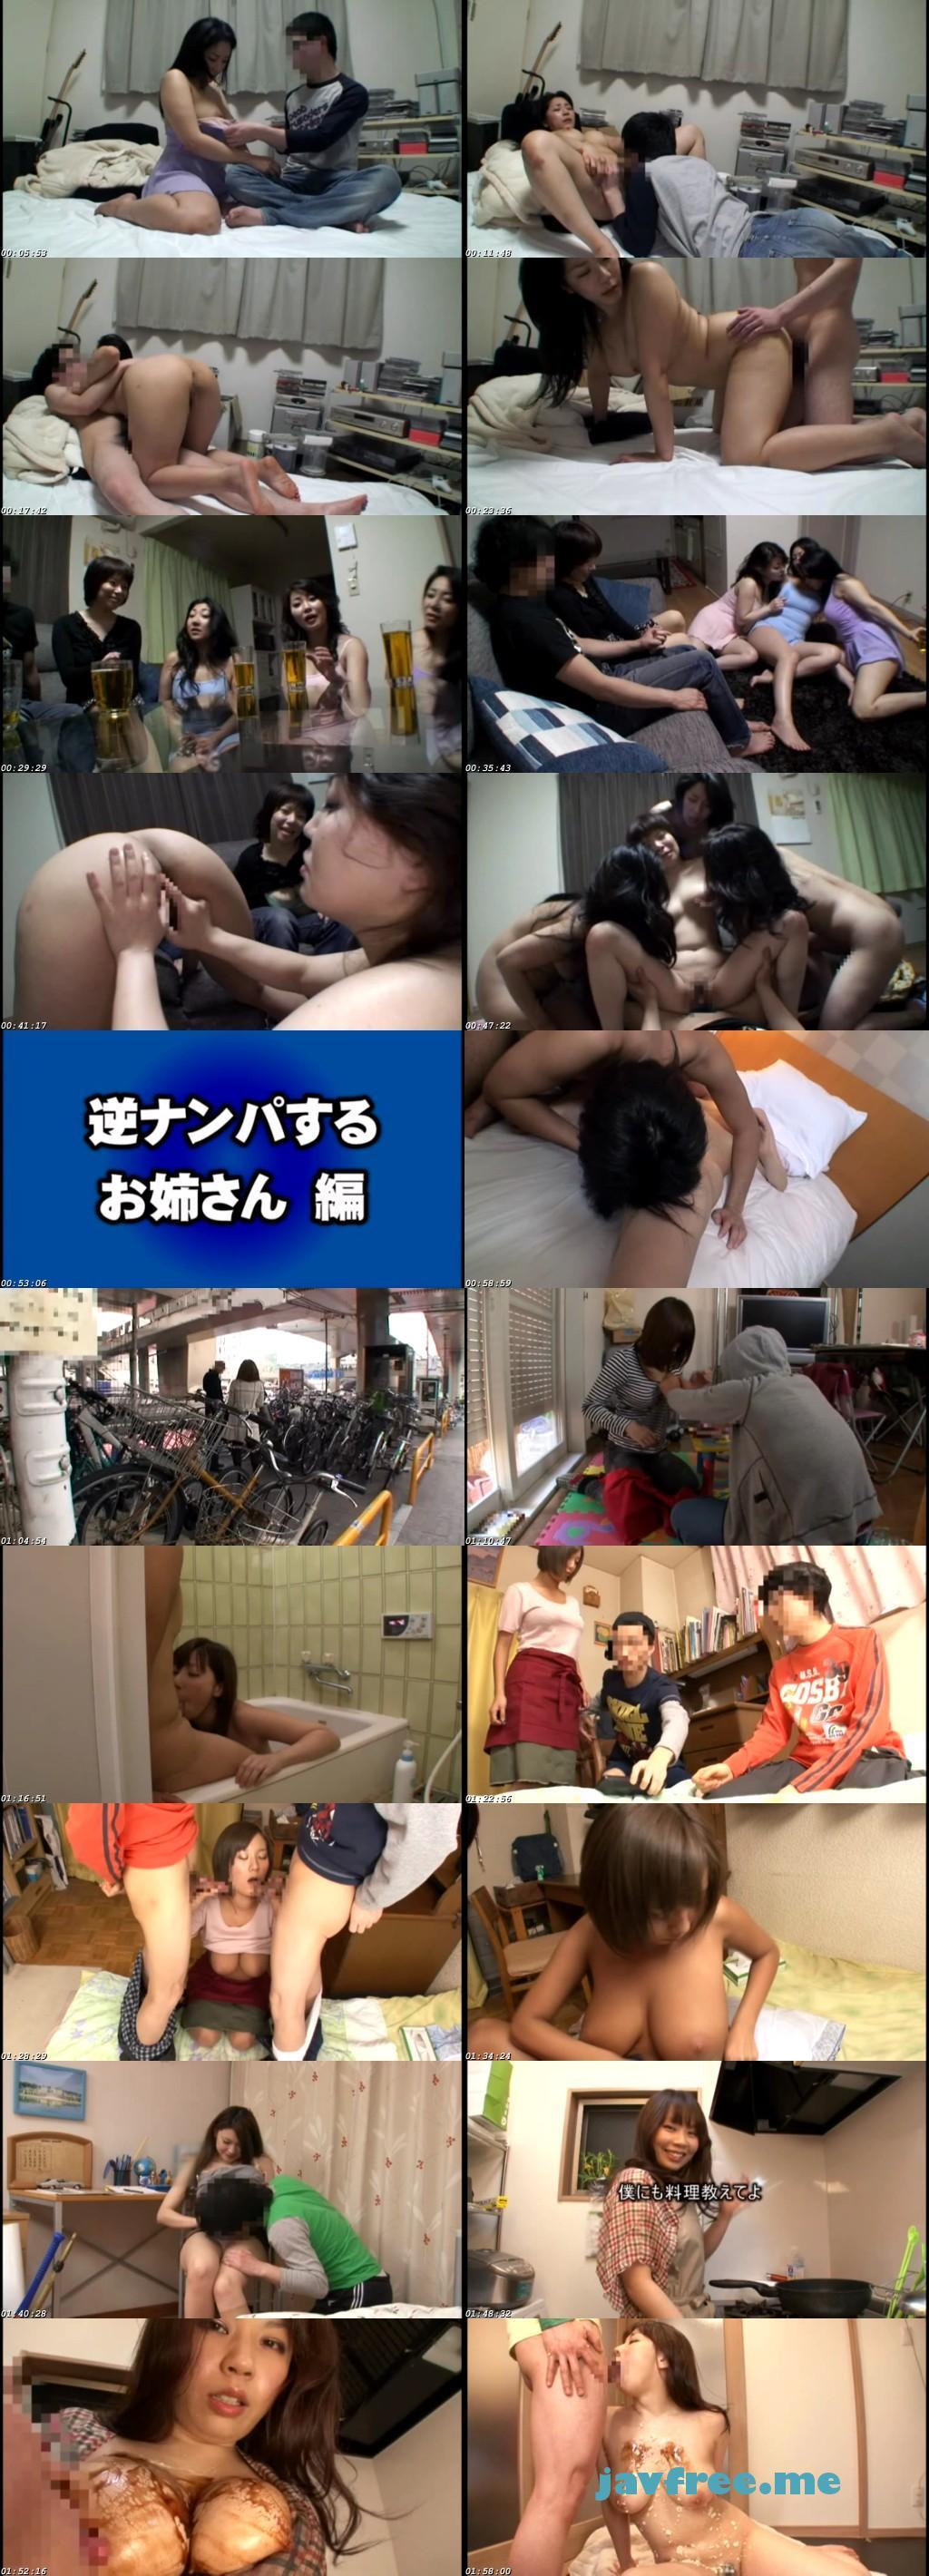 [SGSR-083] 草食系男子好き巨乳お姉さんがやさしく教えてあげる 4時間 - image SGSR-083b on https://javfree.me